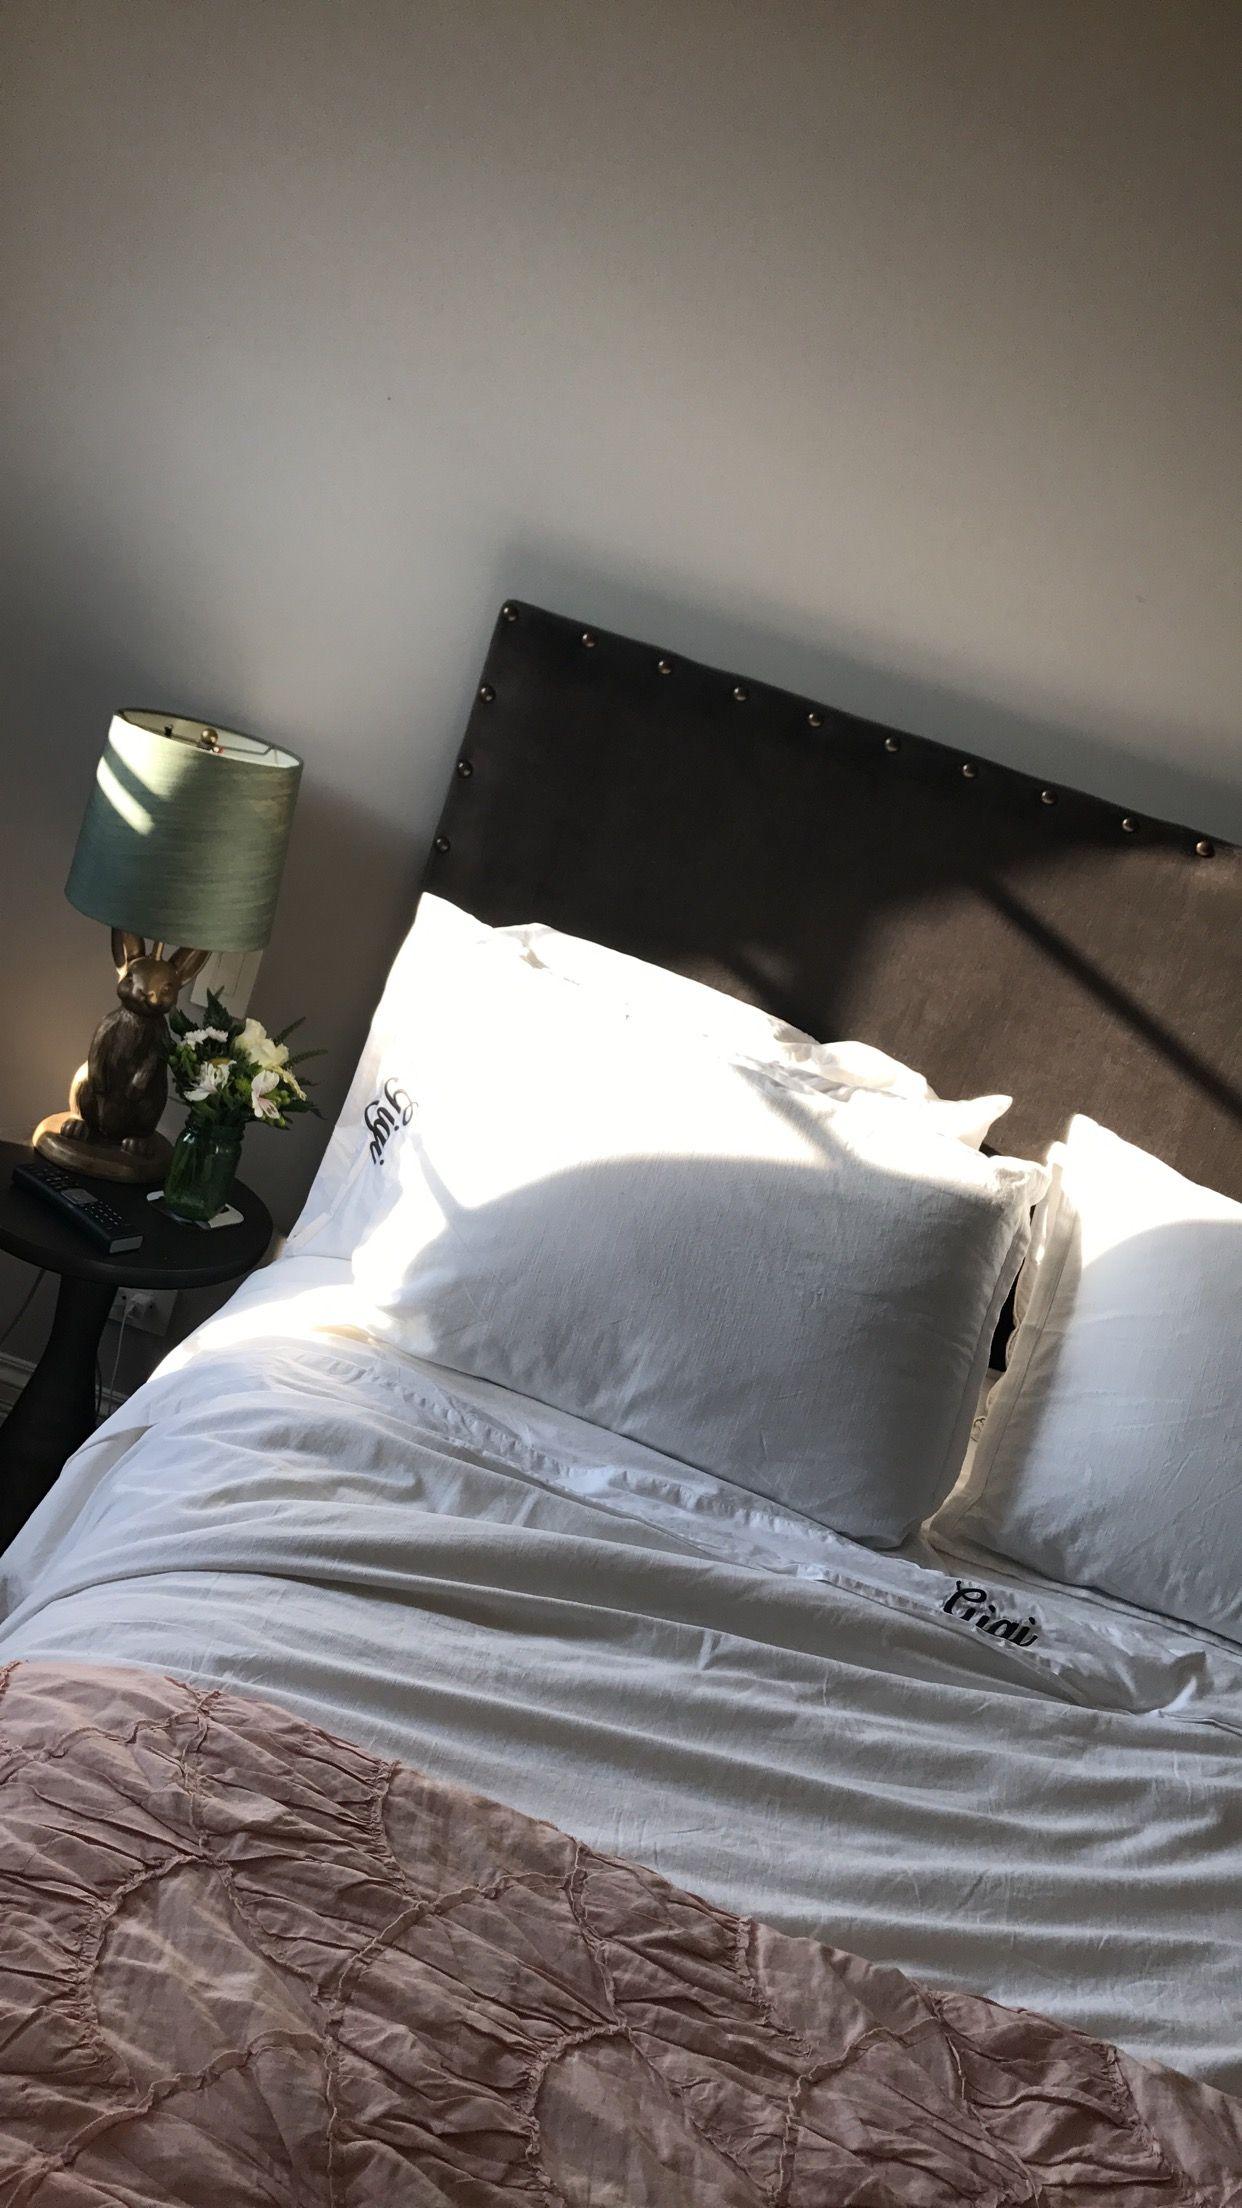 Bedroom goals | Bedroom goals, Bed pillows, Home decor